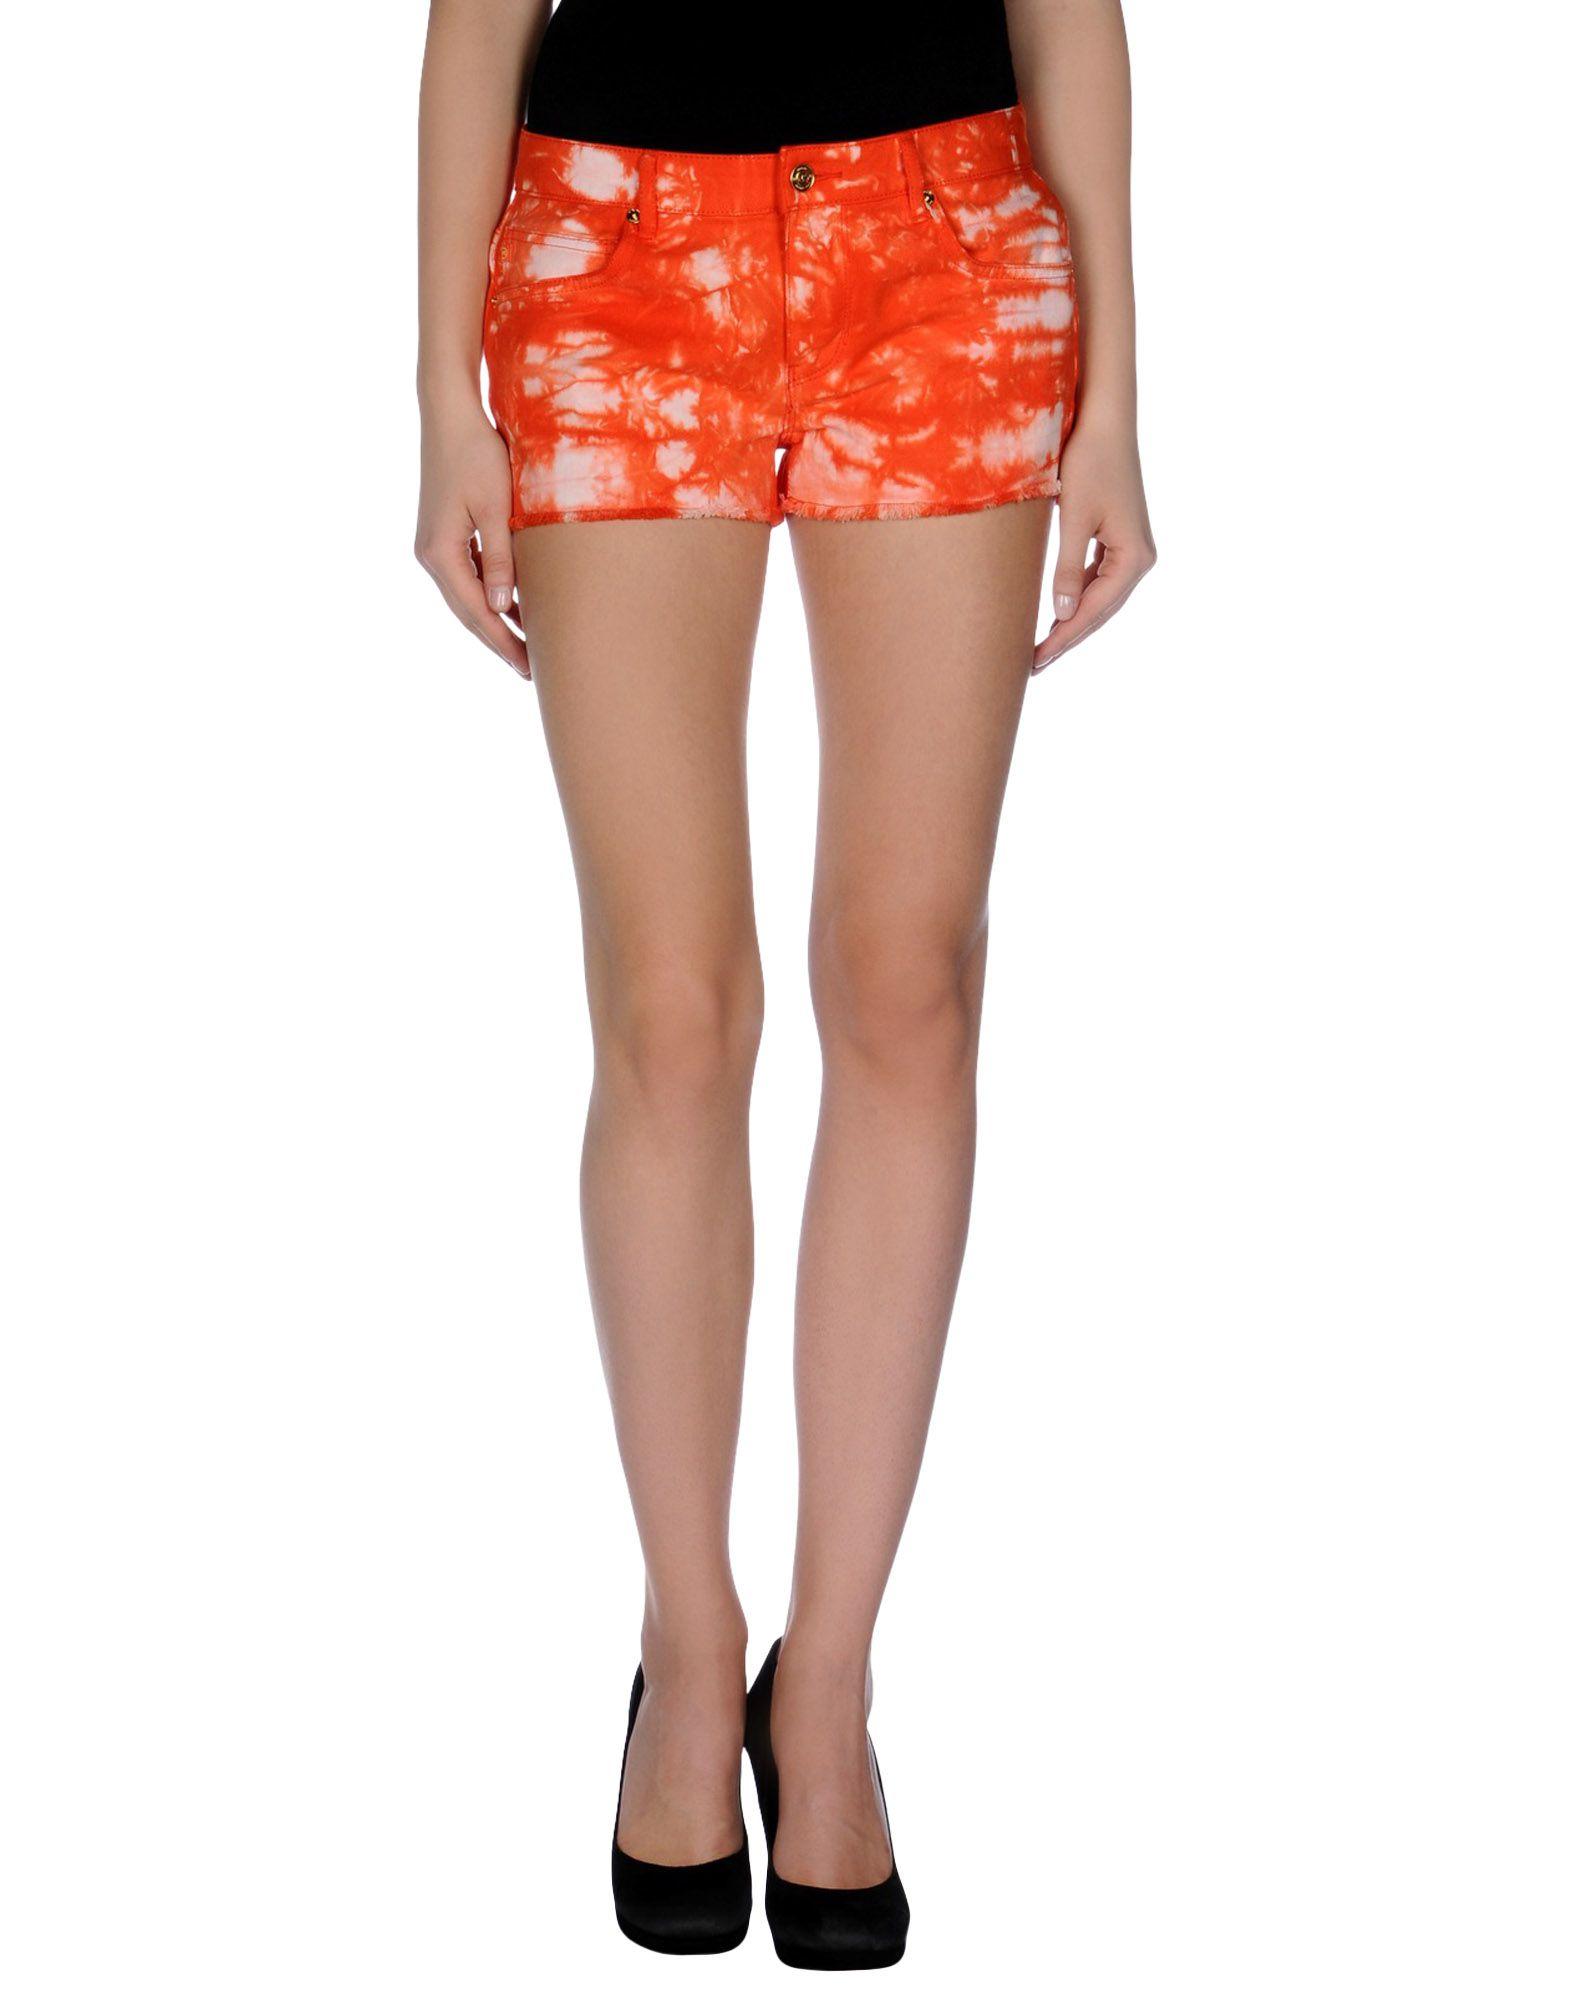 michael kors female michael kors shorts